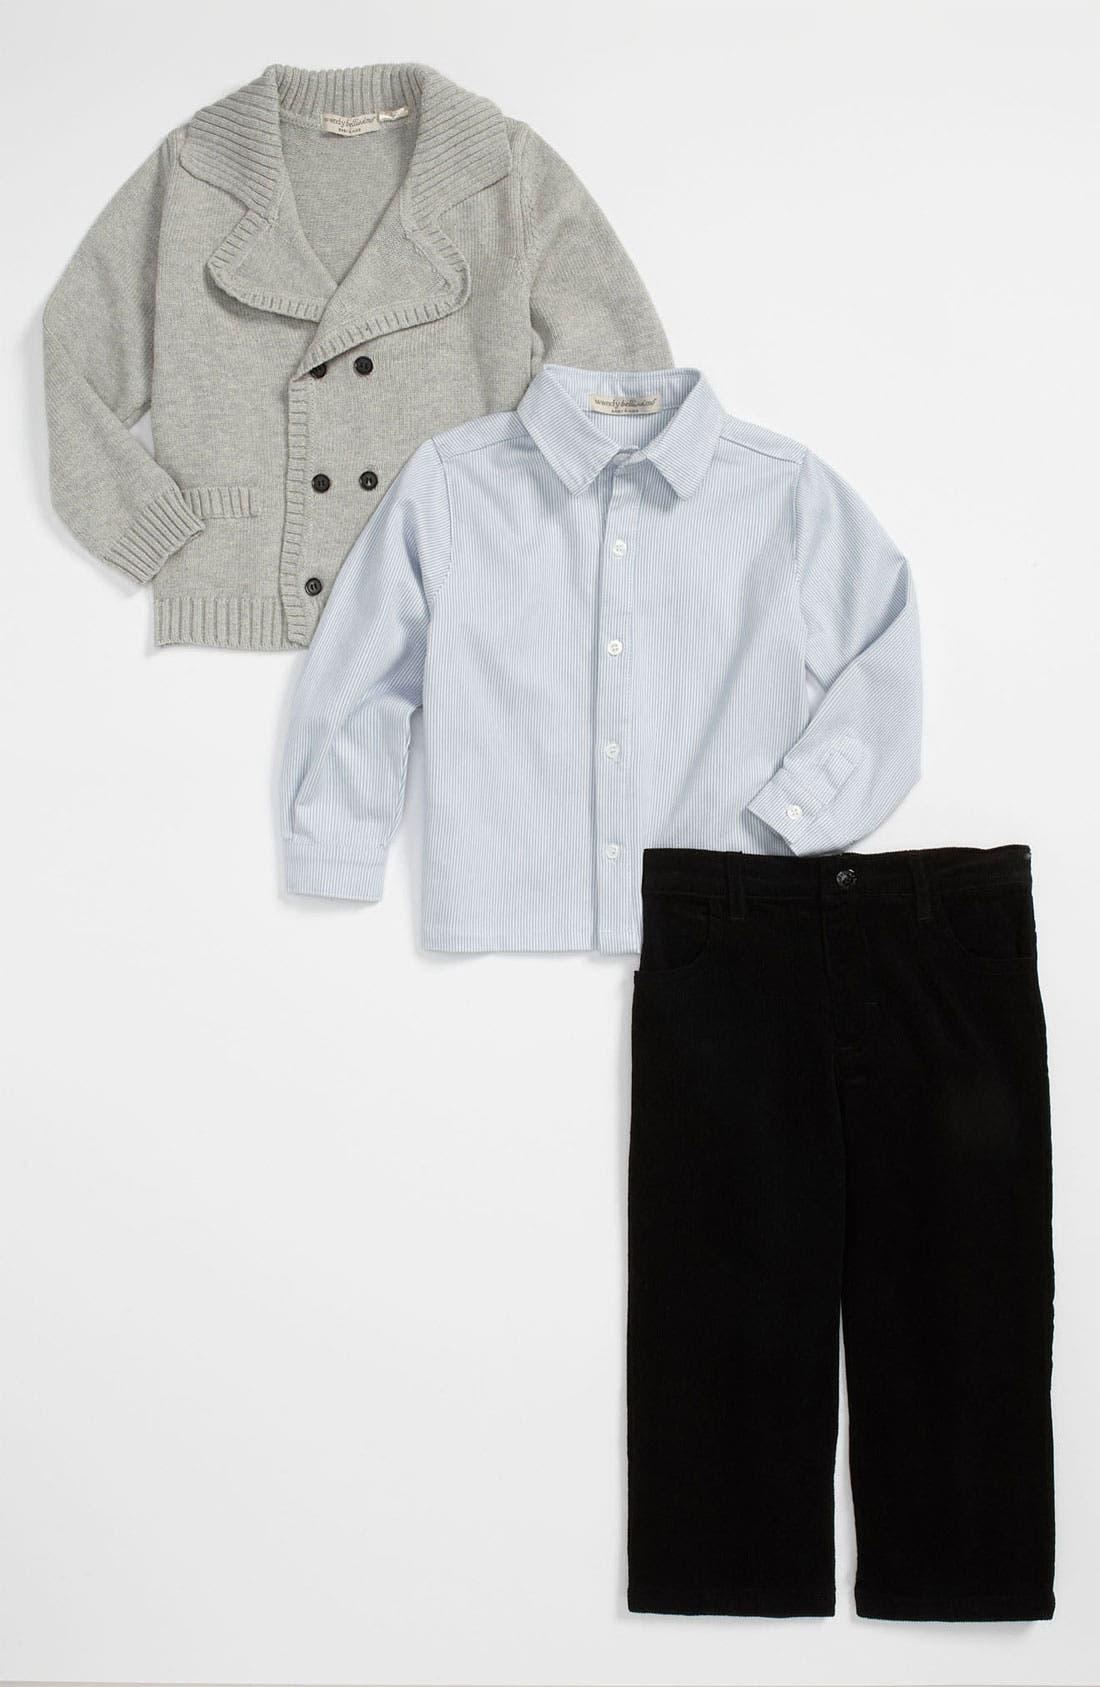 Main Image - Wendy Bellissimo Cardigan, Shirt & Pants Set (Infant)